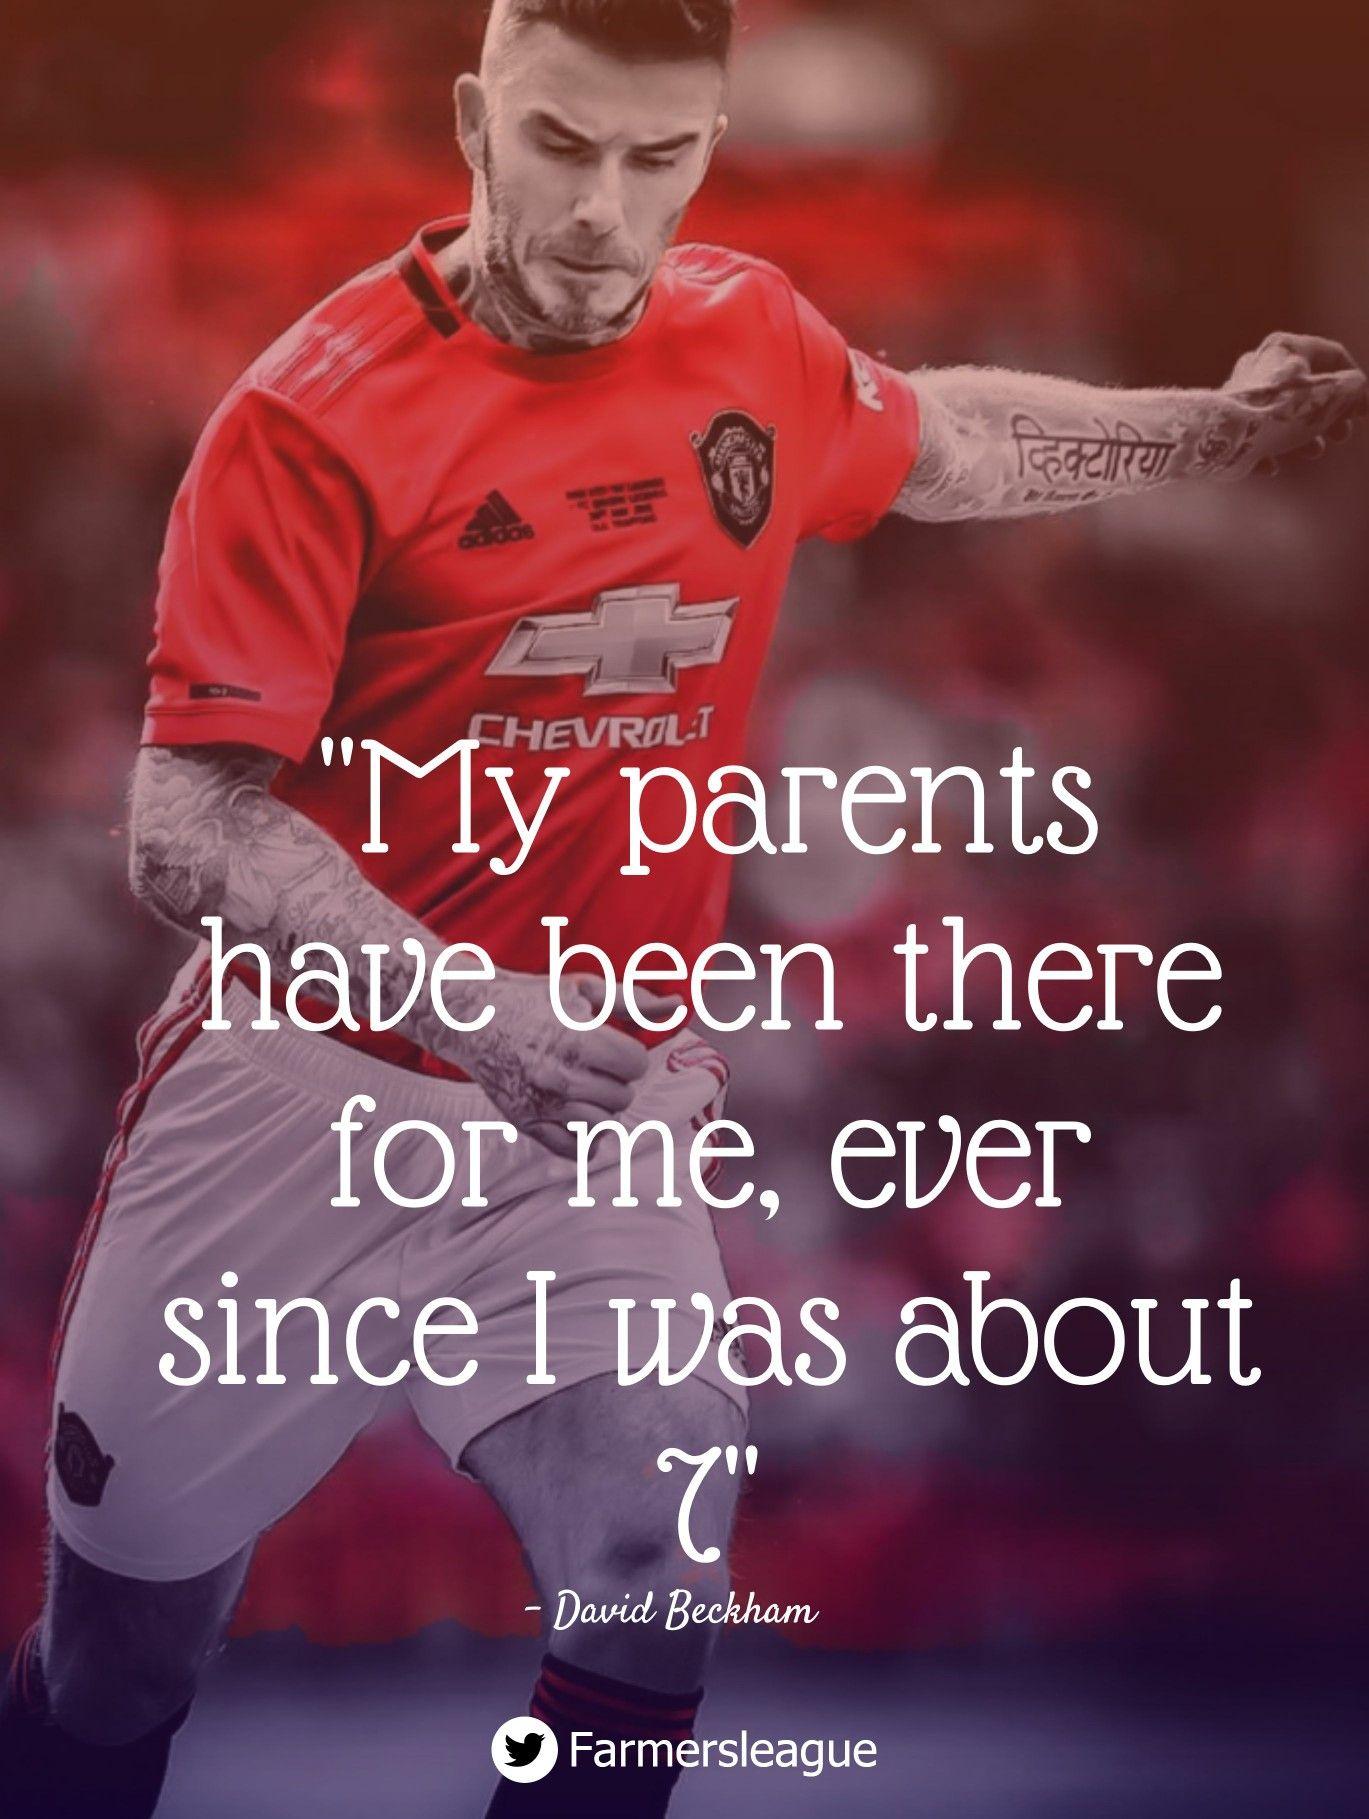 David Beckham Quotes Football Quotes Funny Soccer Quotes Funny David Beckham Quotes